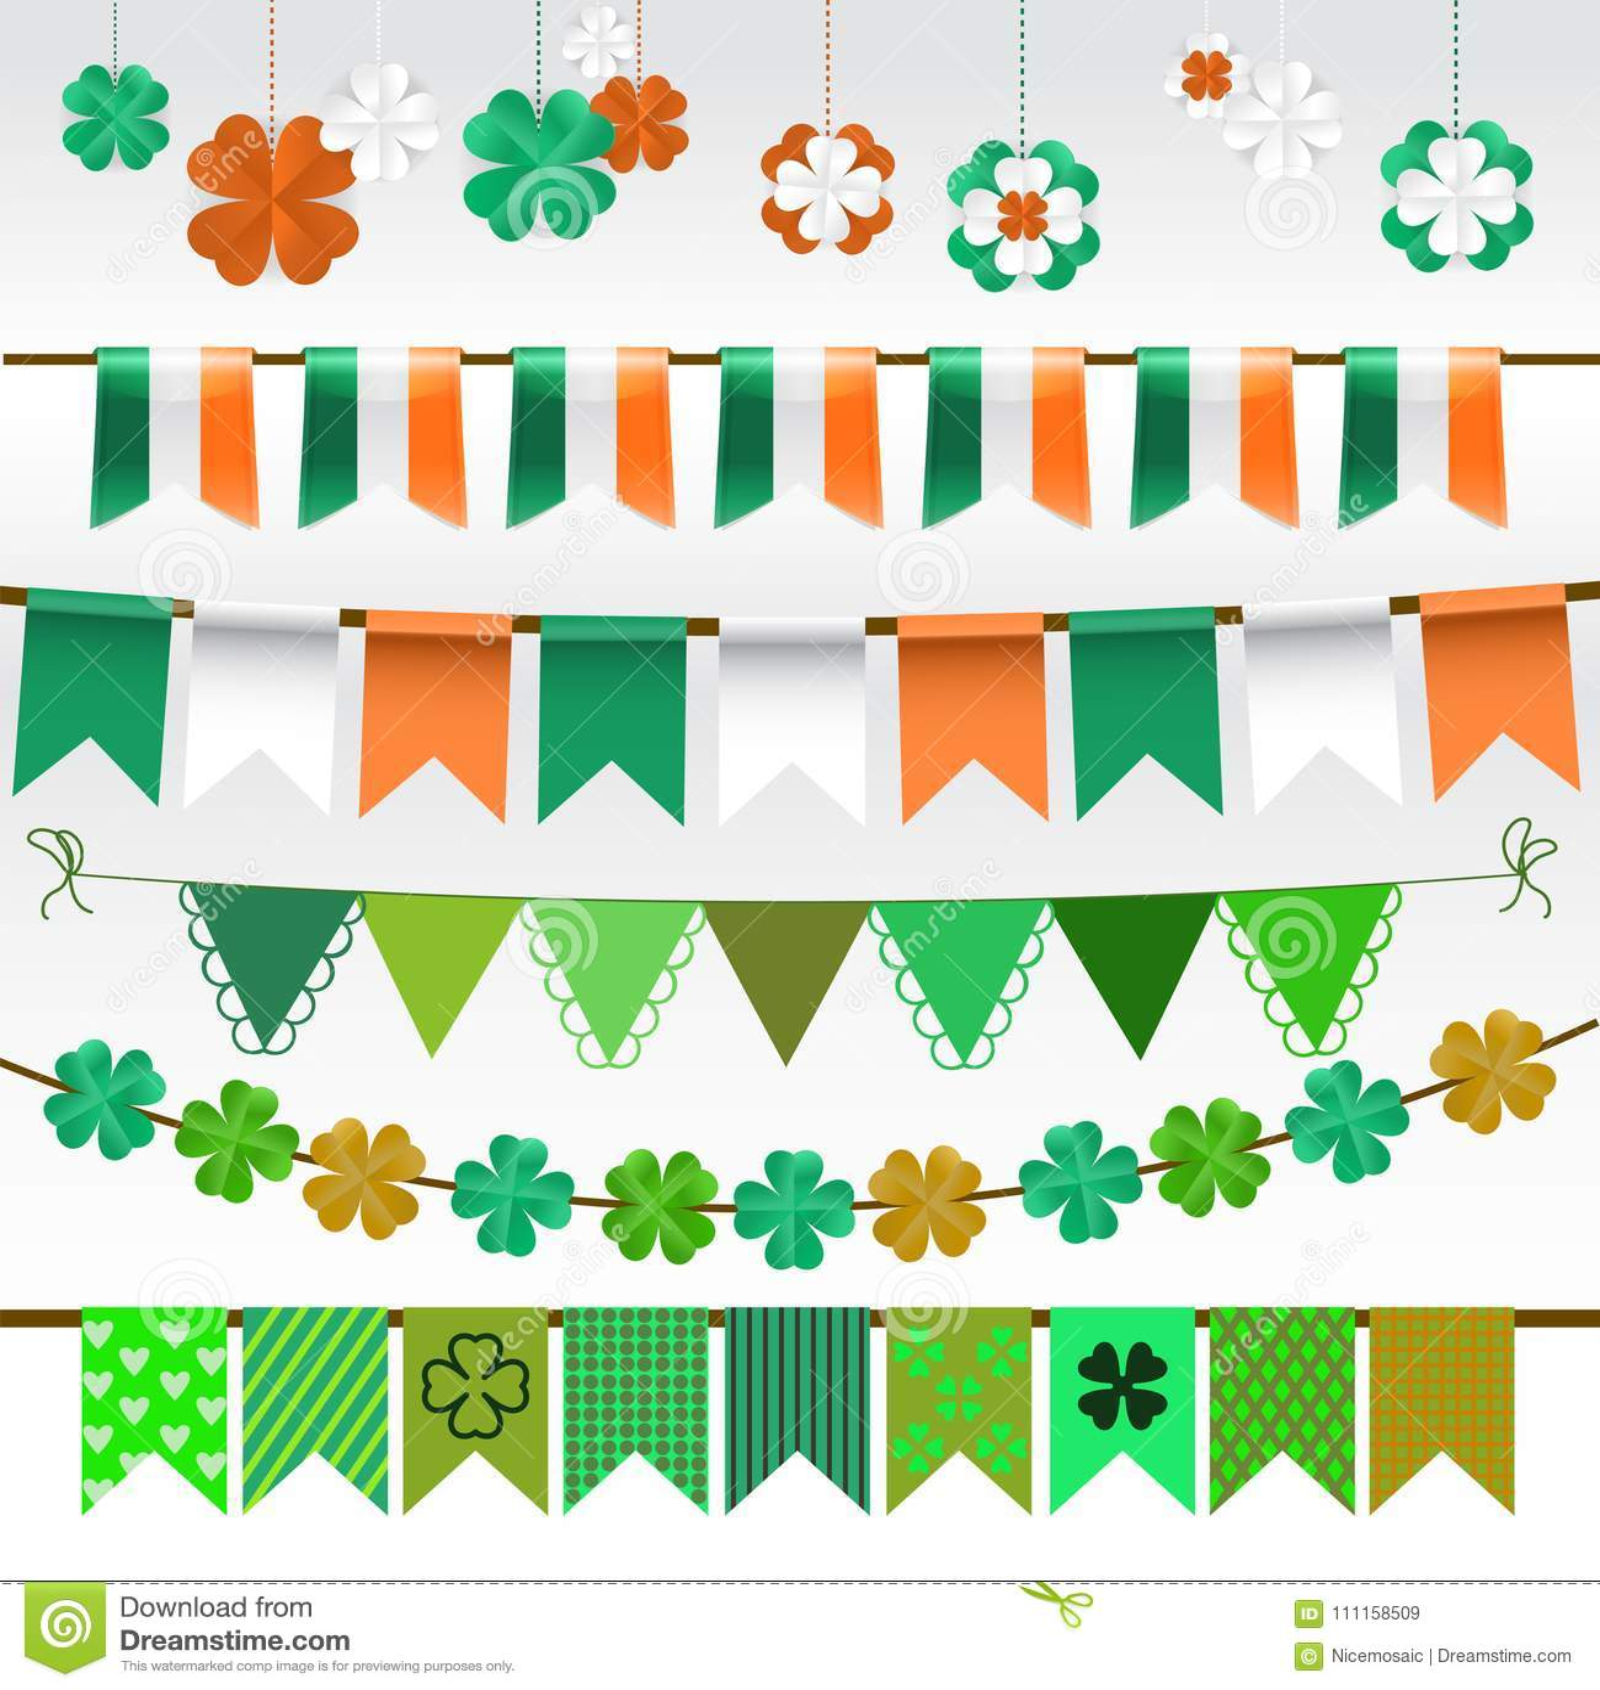 Set Of Saint Patricks Day Decorations Isolated On White